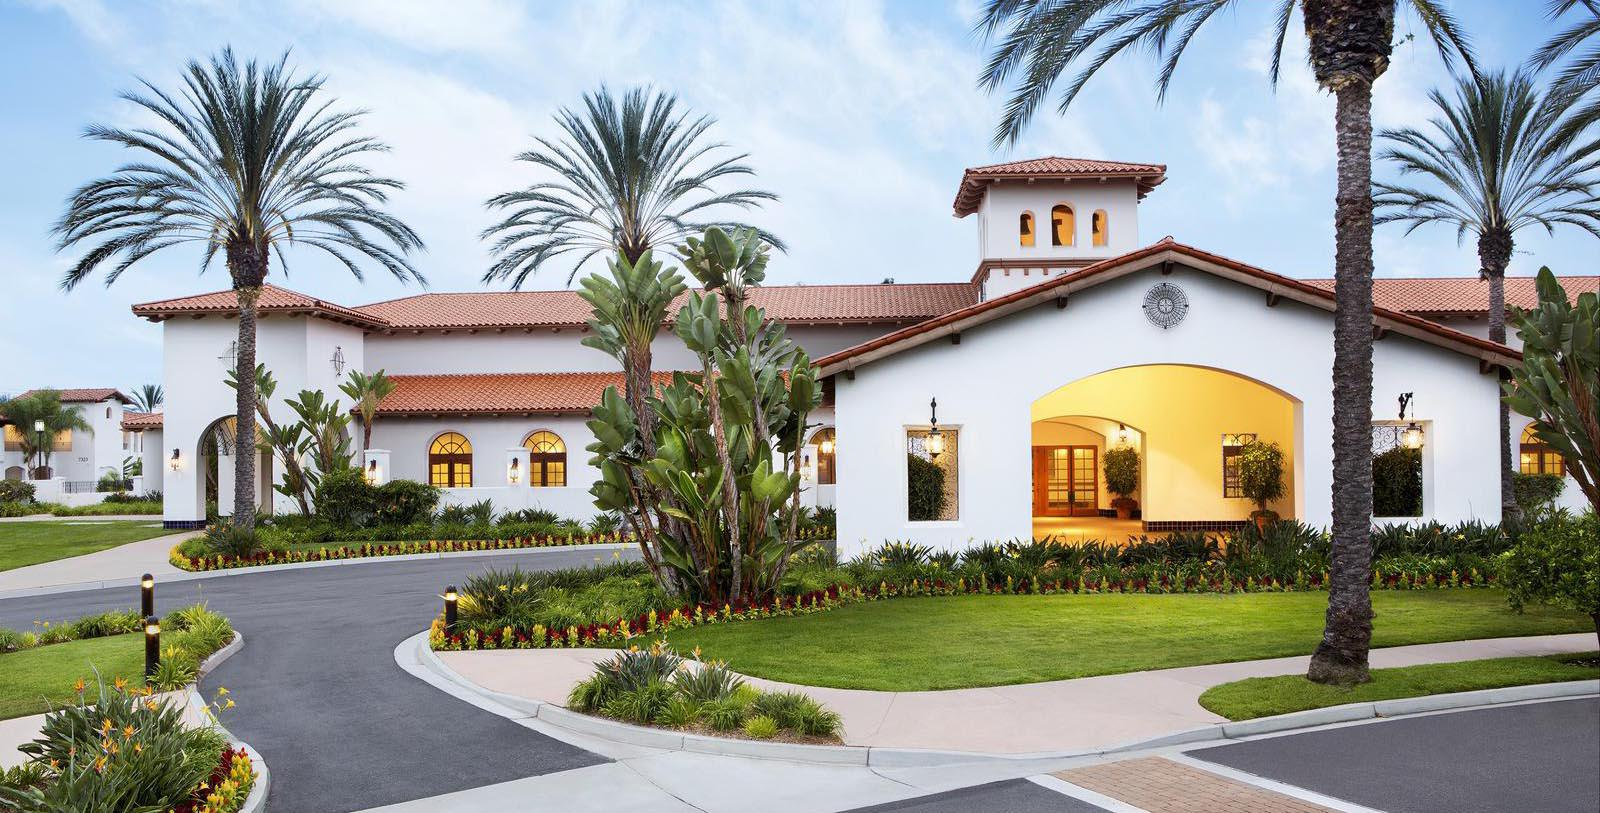 Image of Hotel Exterior & Entrance, Omni La Costa Resort & Spa, Carlsbad, California, 1965, Member of Historic Hotels of America, Discover